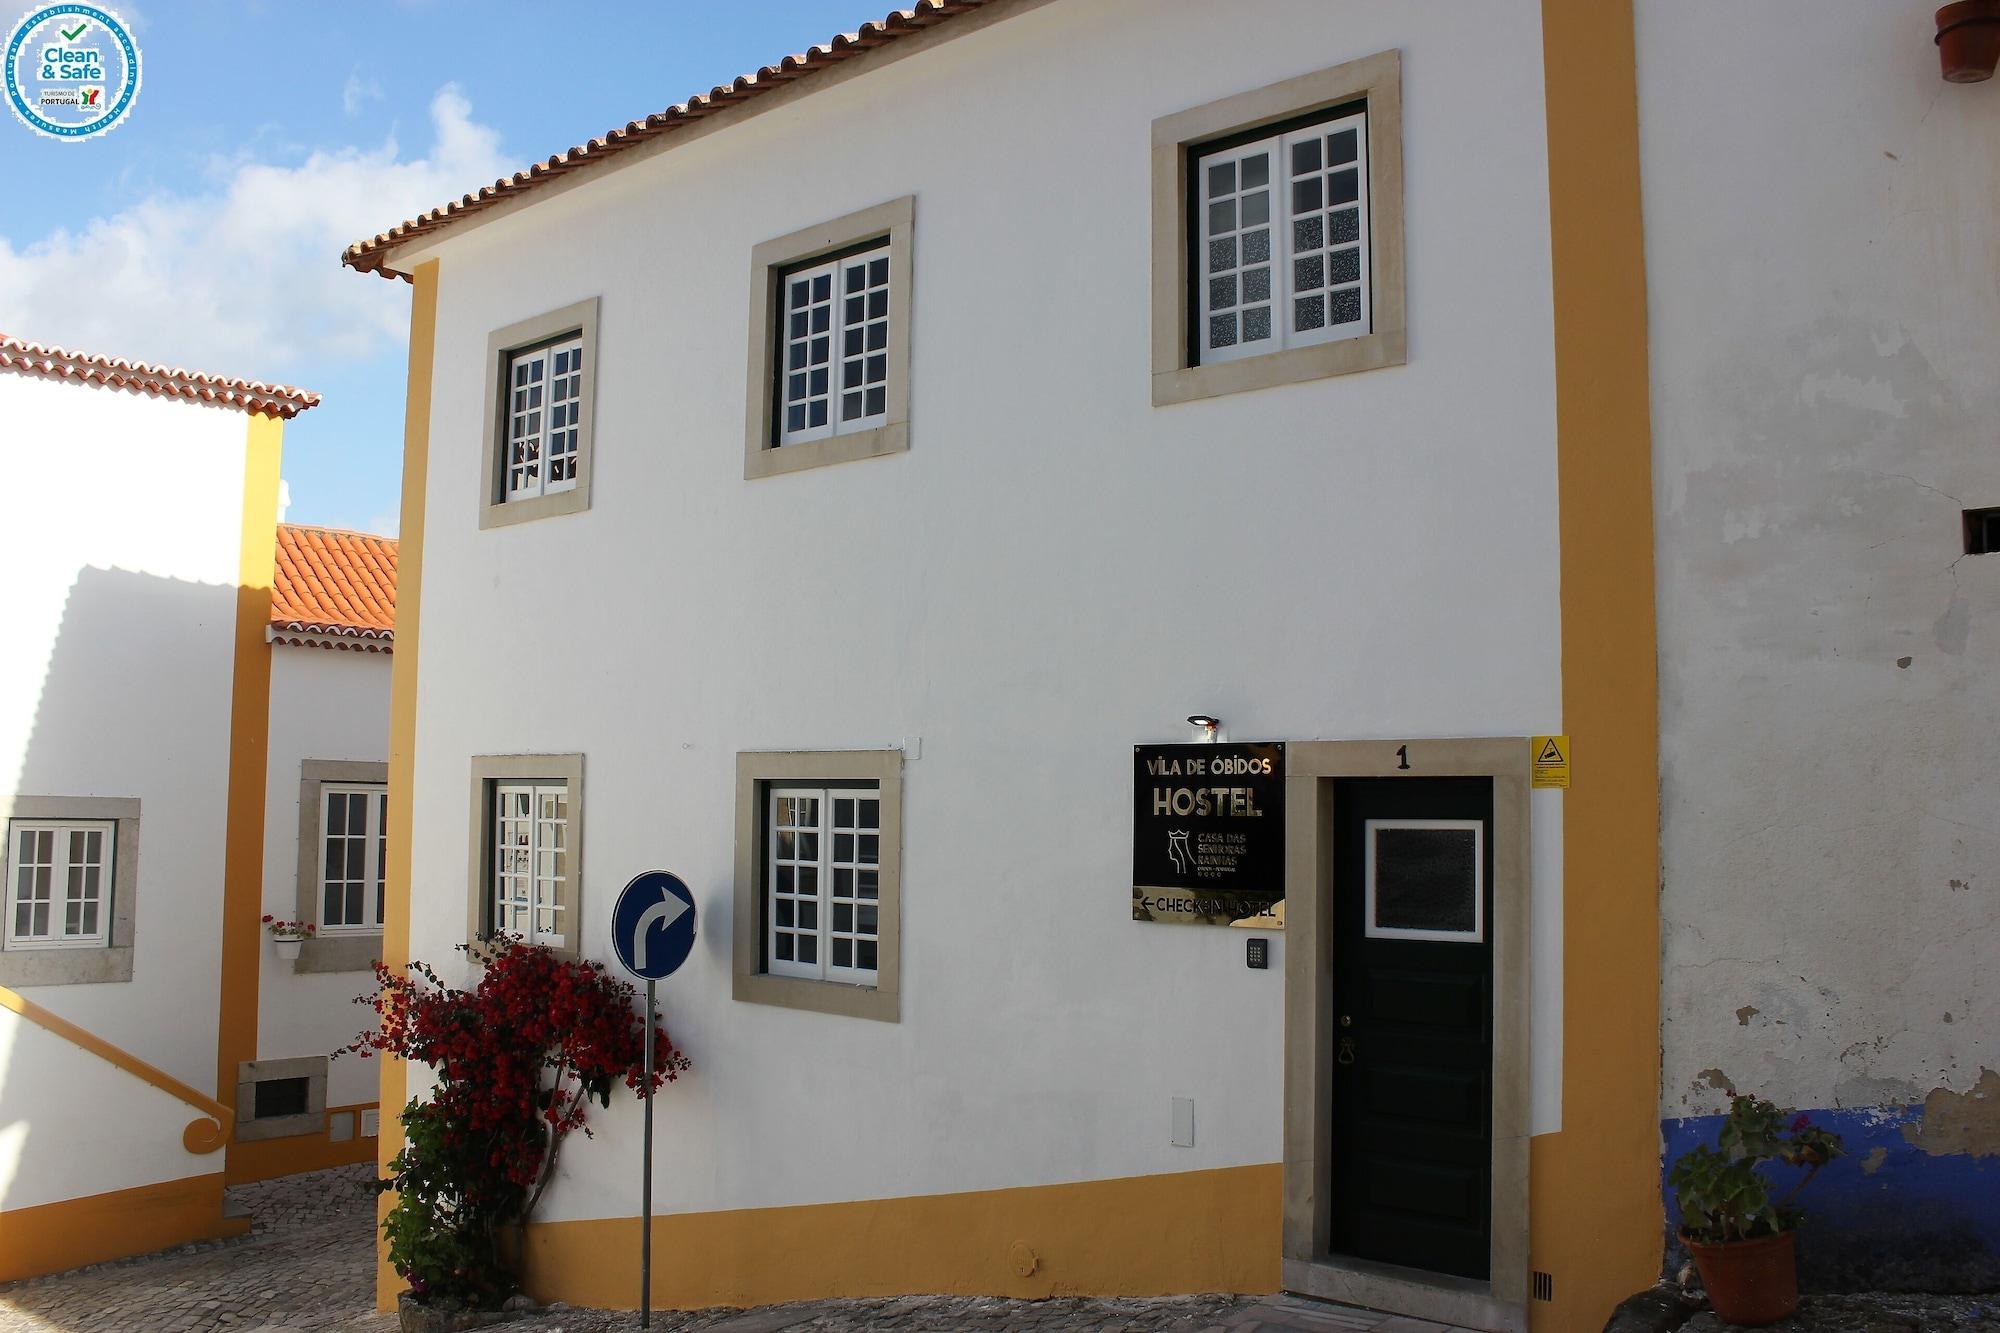 Hostel Vila de Óbidos, Óbidos